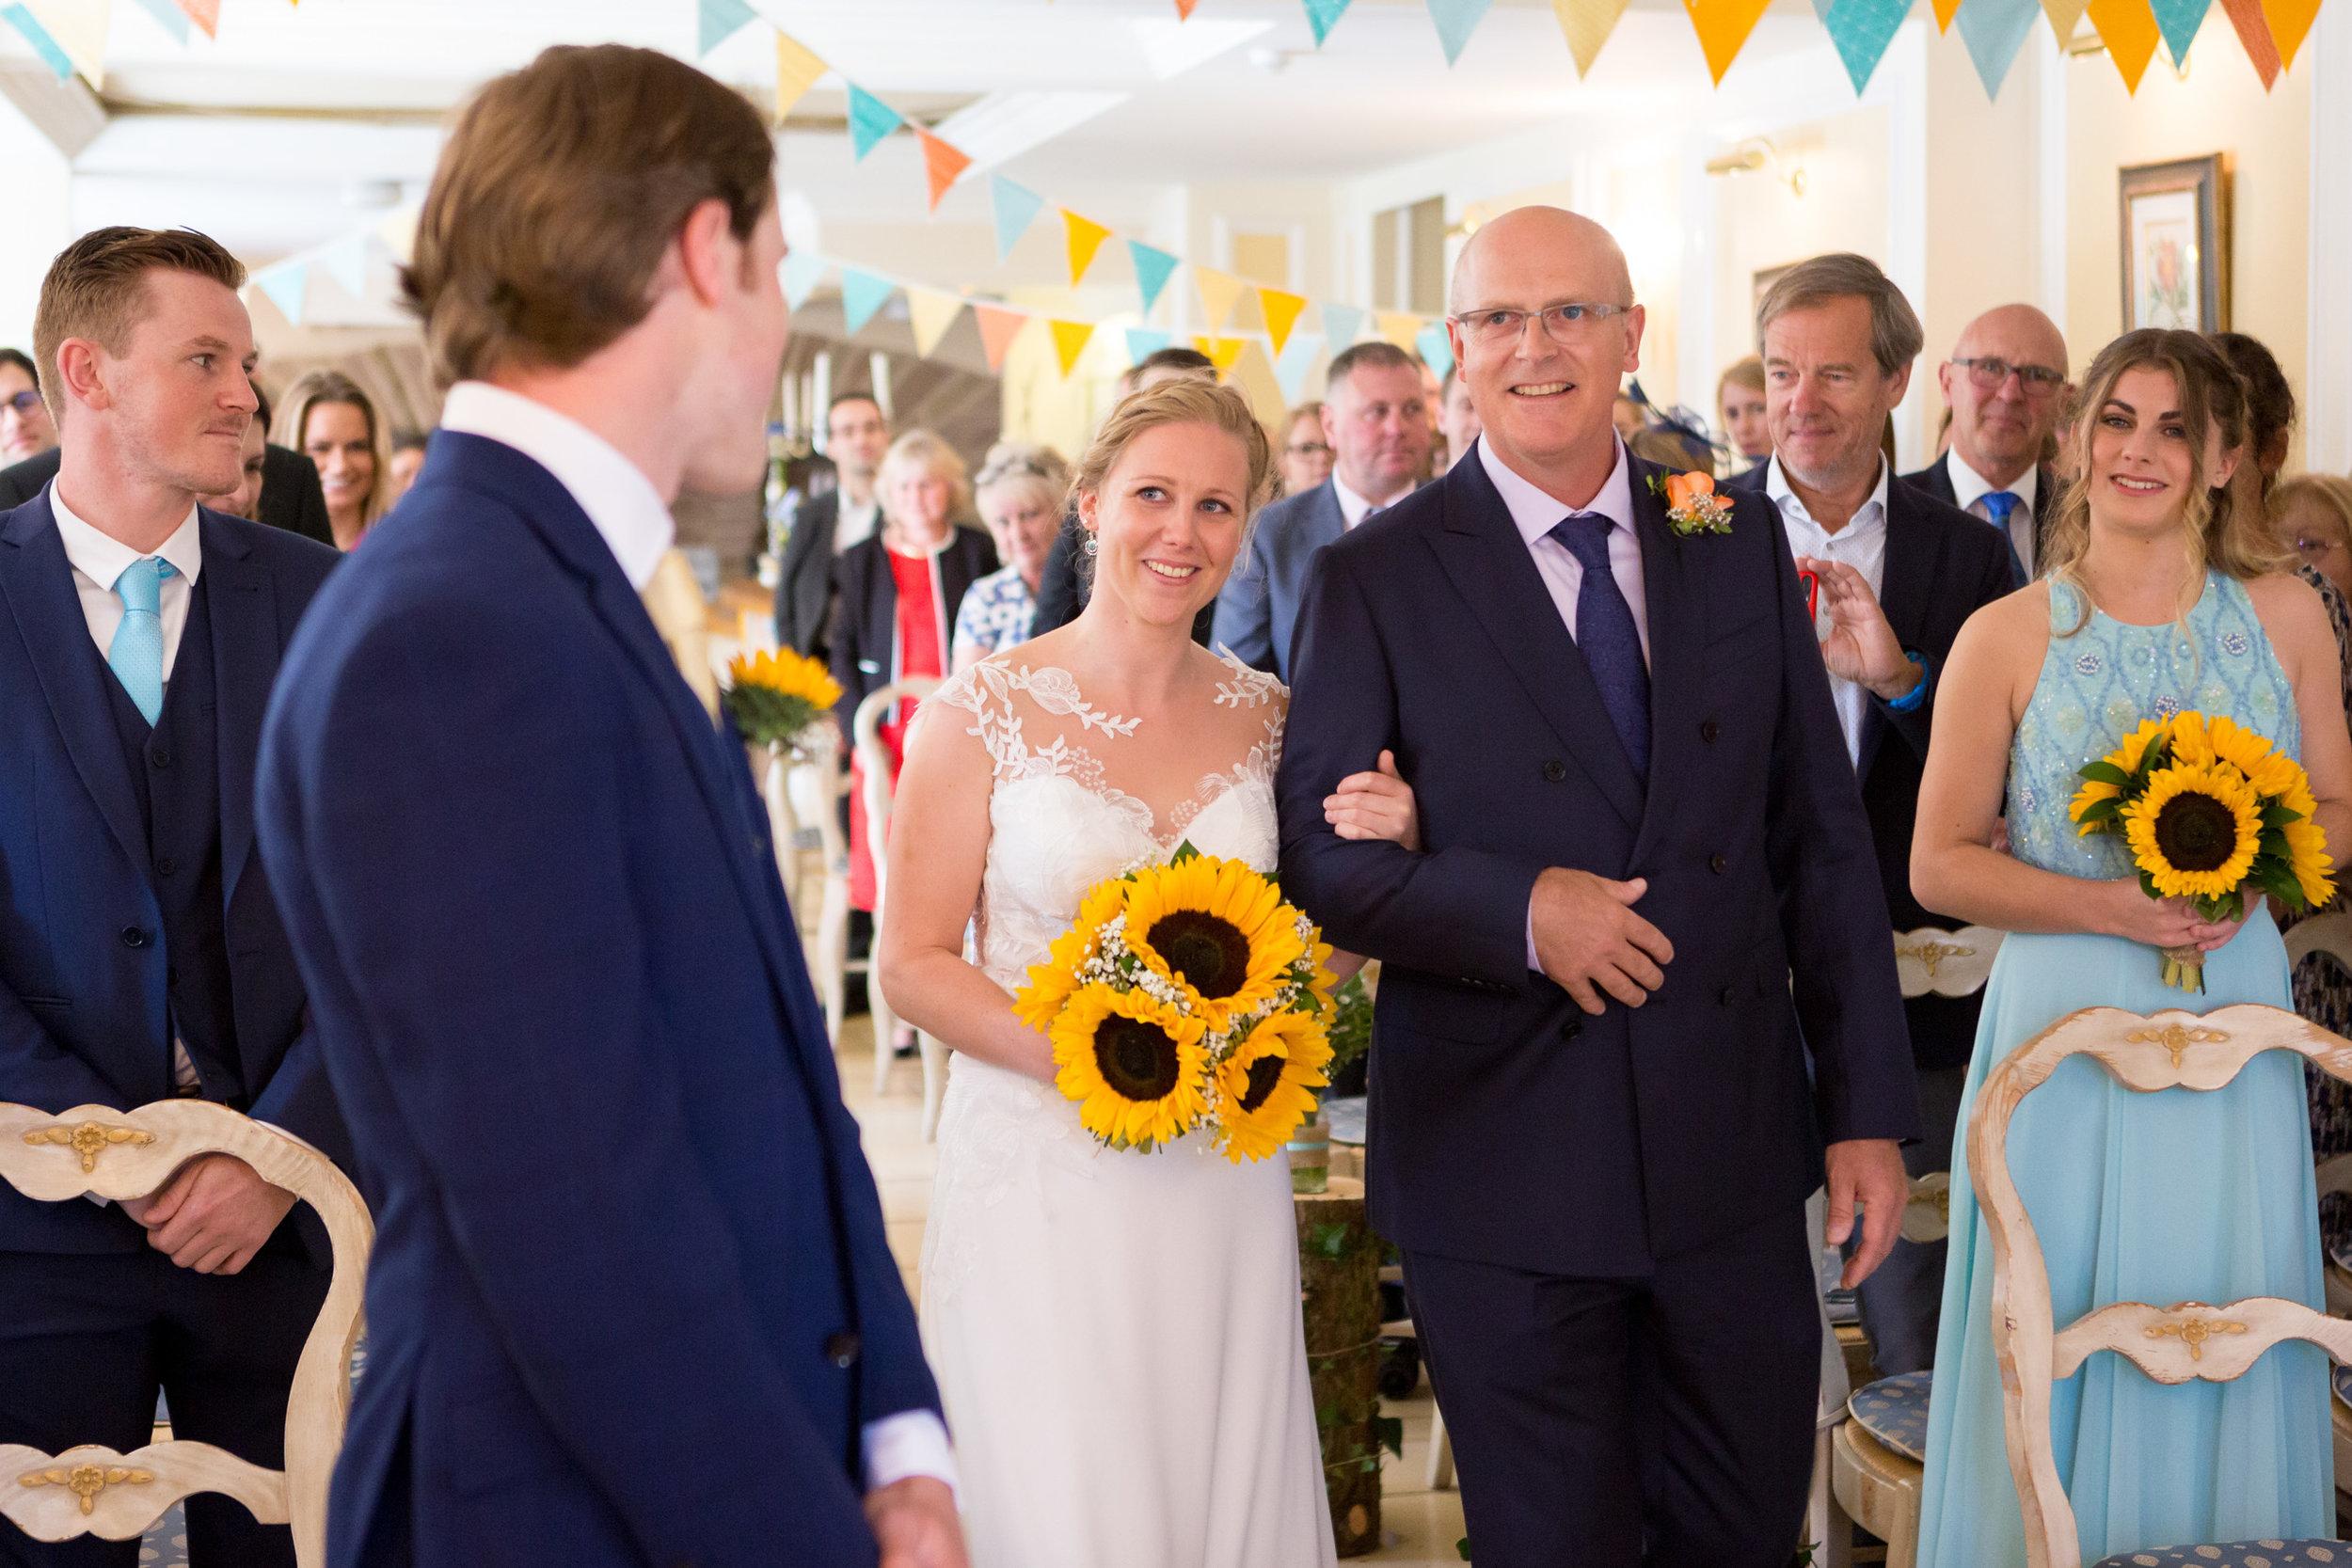 Bucklands-Tout-Saints-Hotel-Devon-Wedding-Photography-10.jpg